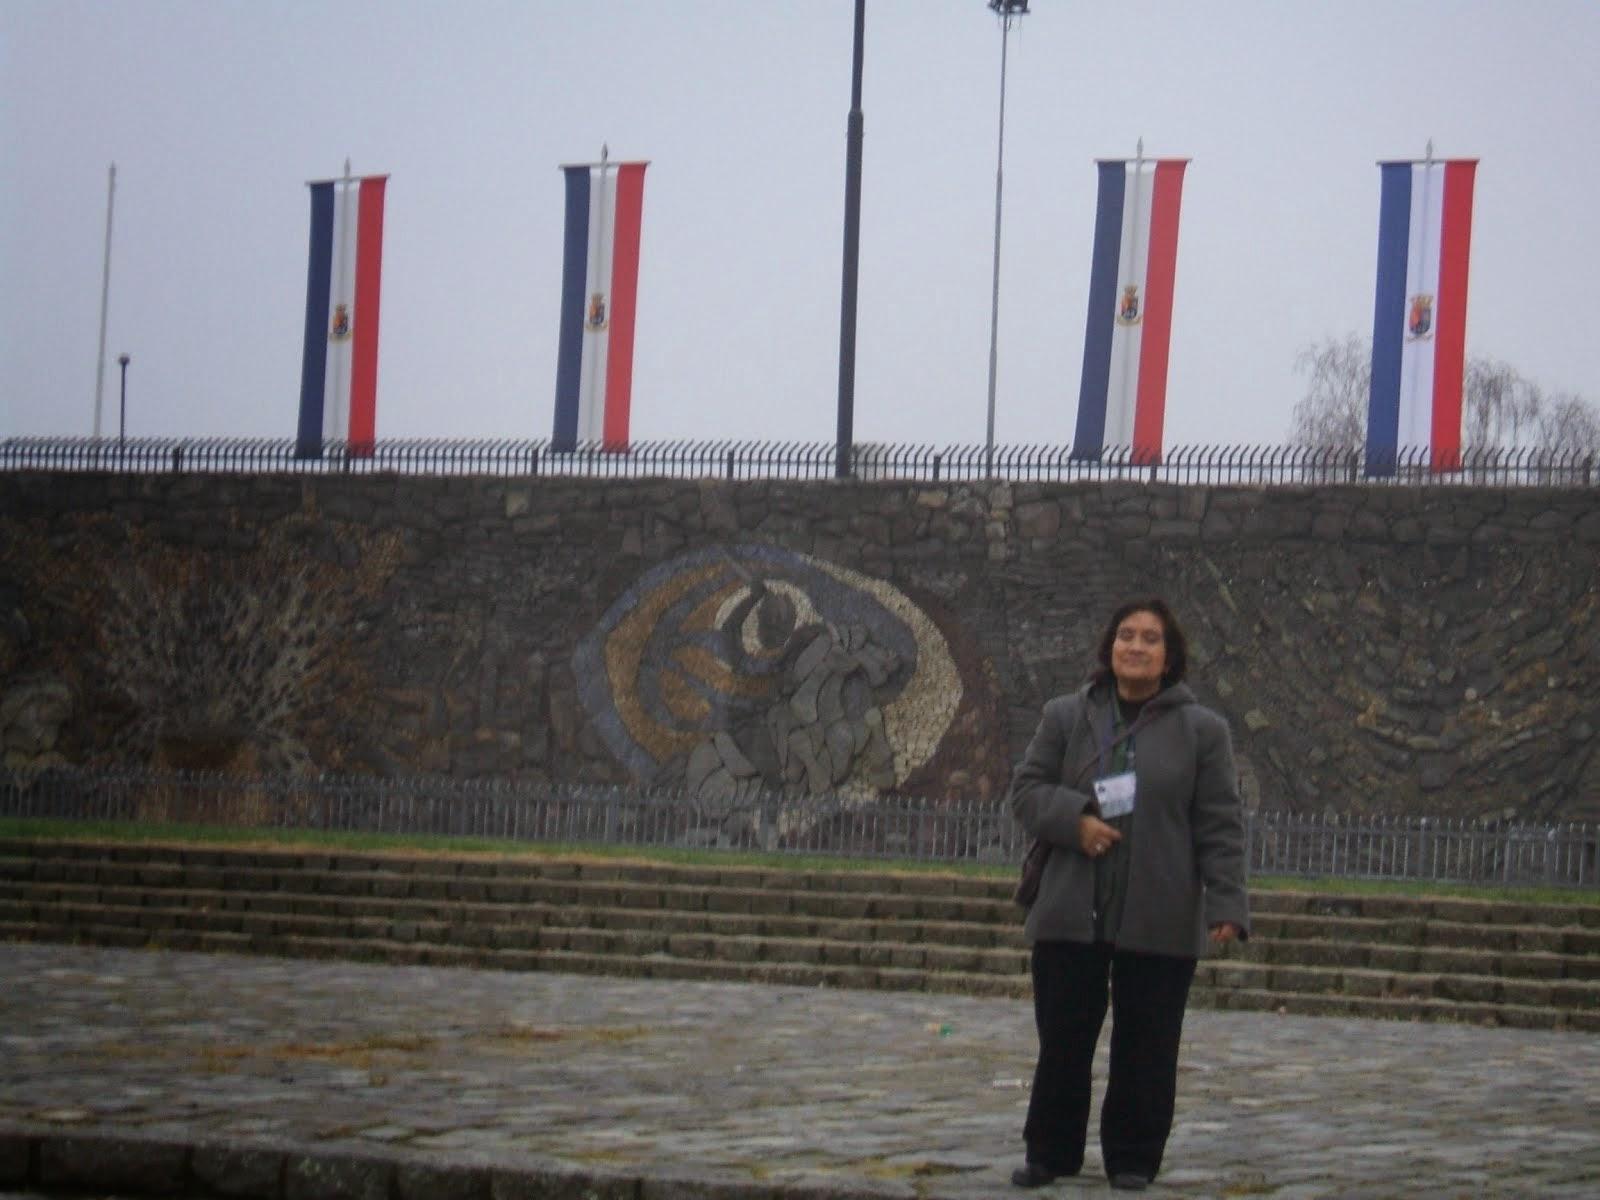 Evelina Rojas en Parque Monumental Bernardo O'Higgins - agosto 2012